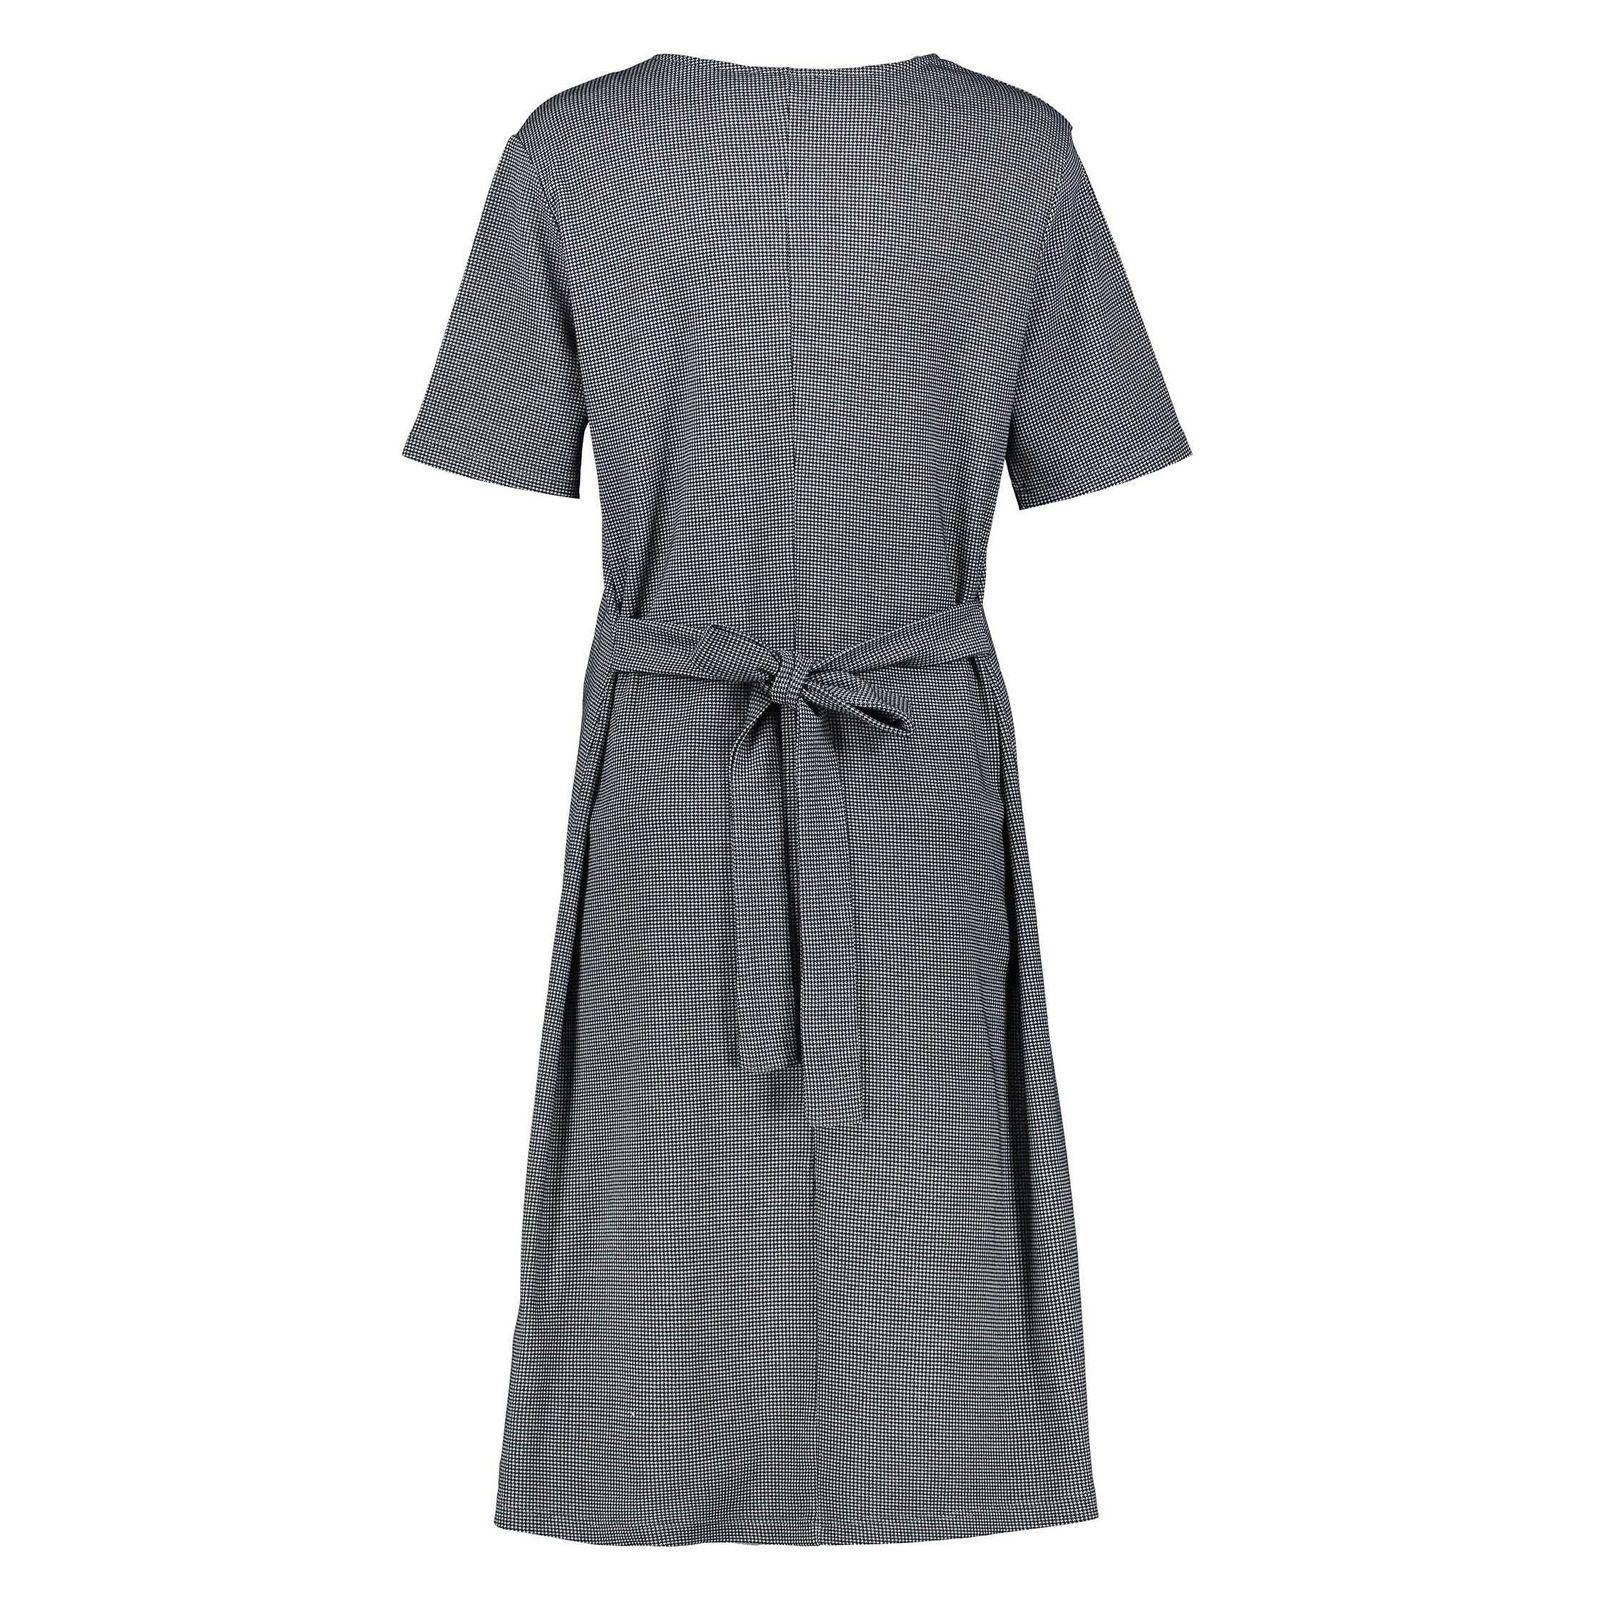 پیراهن نخی میدی زنانه - کوتون - آبي - 2